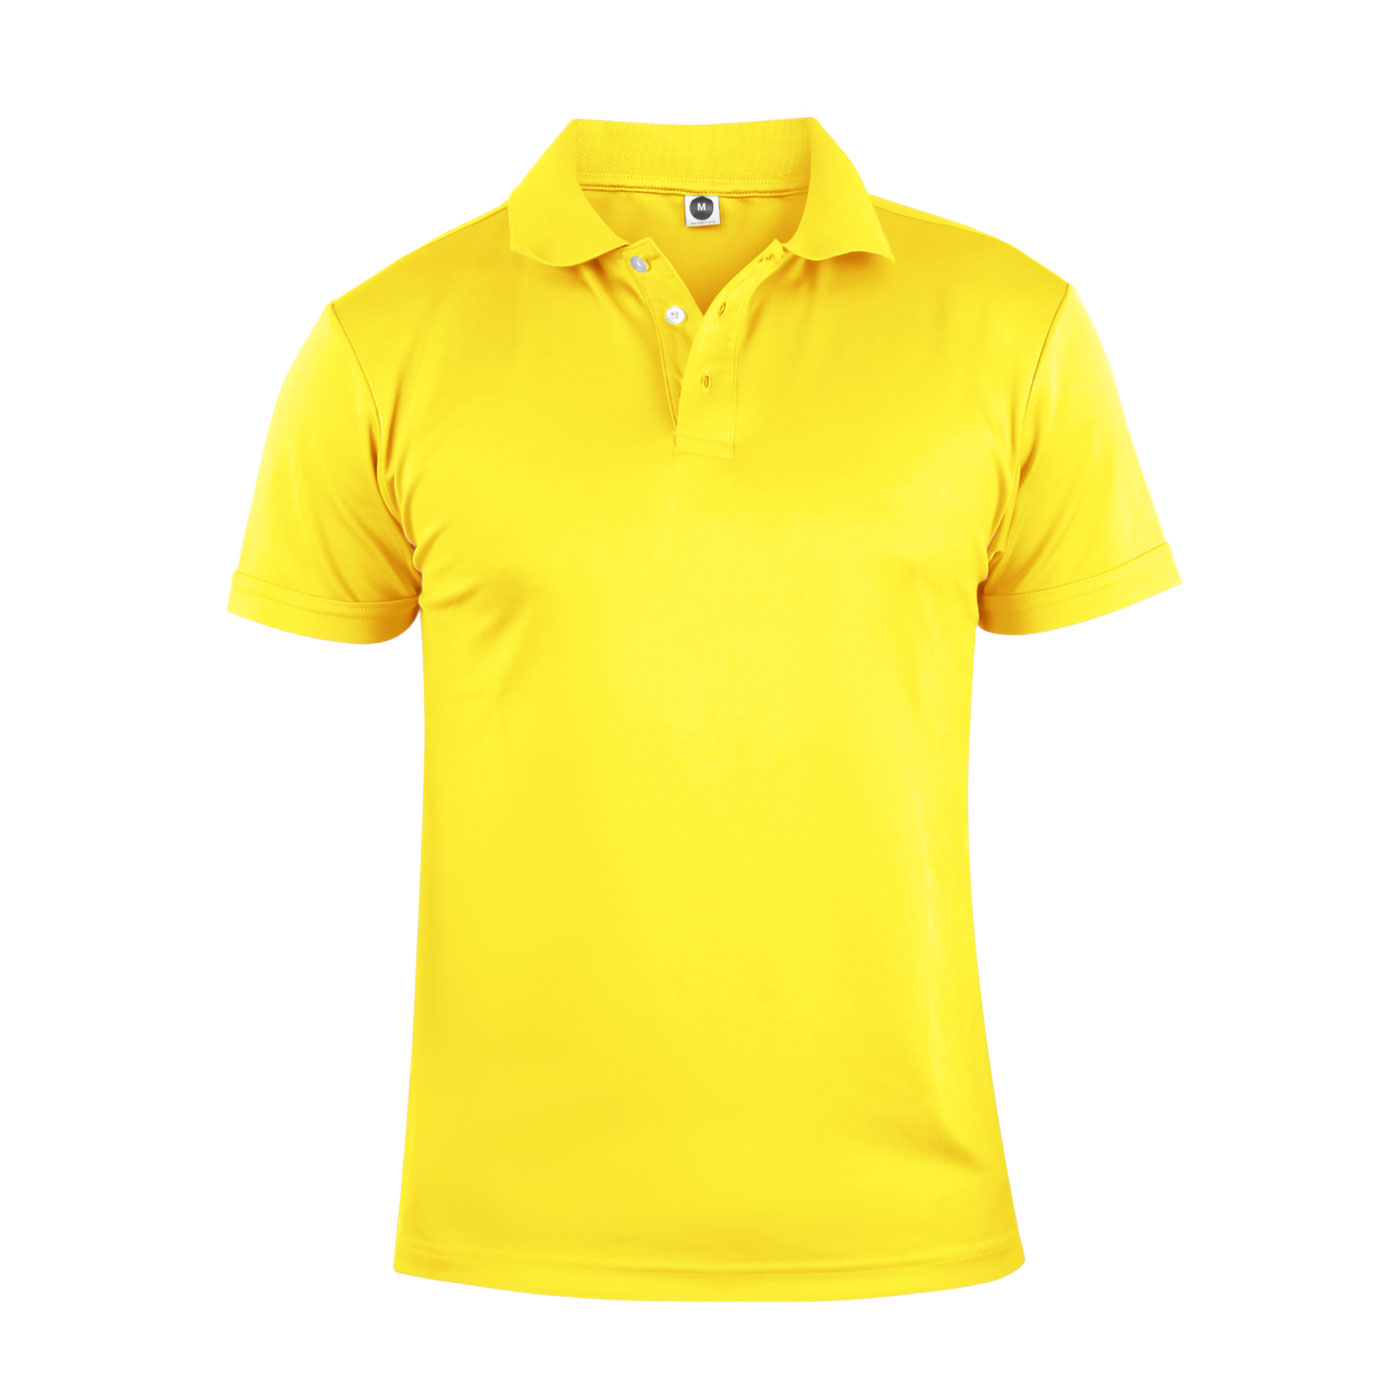 HODARLA 彈力涼感短袖POLO衫 3113901 - 黃